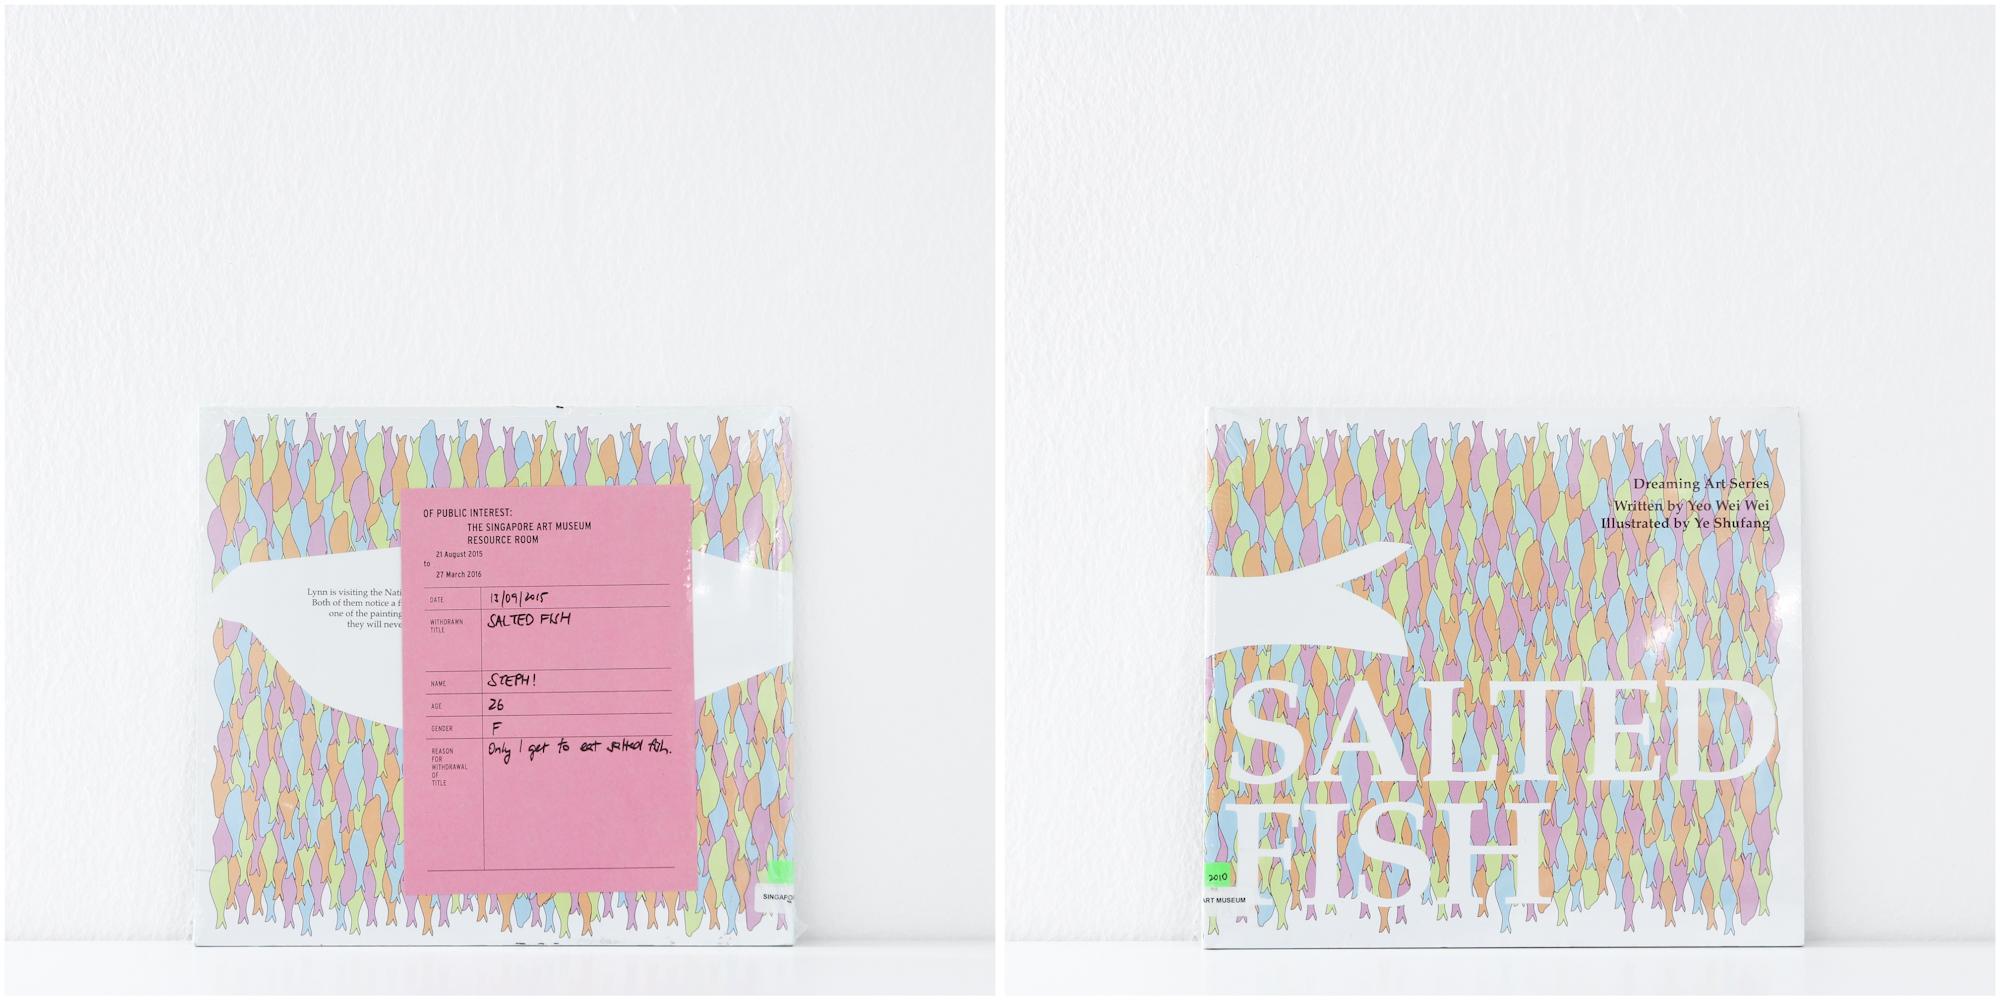 'Salted Fish', 13/9/15, Steph!, 26, Female